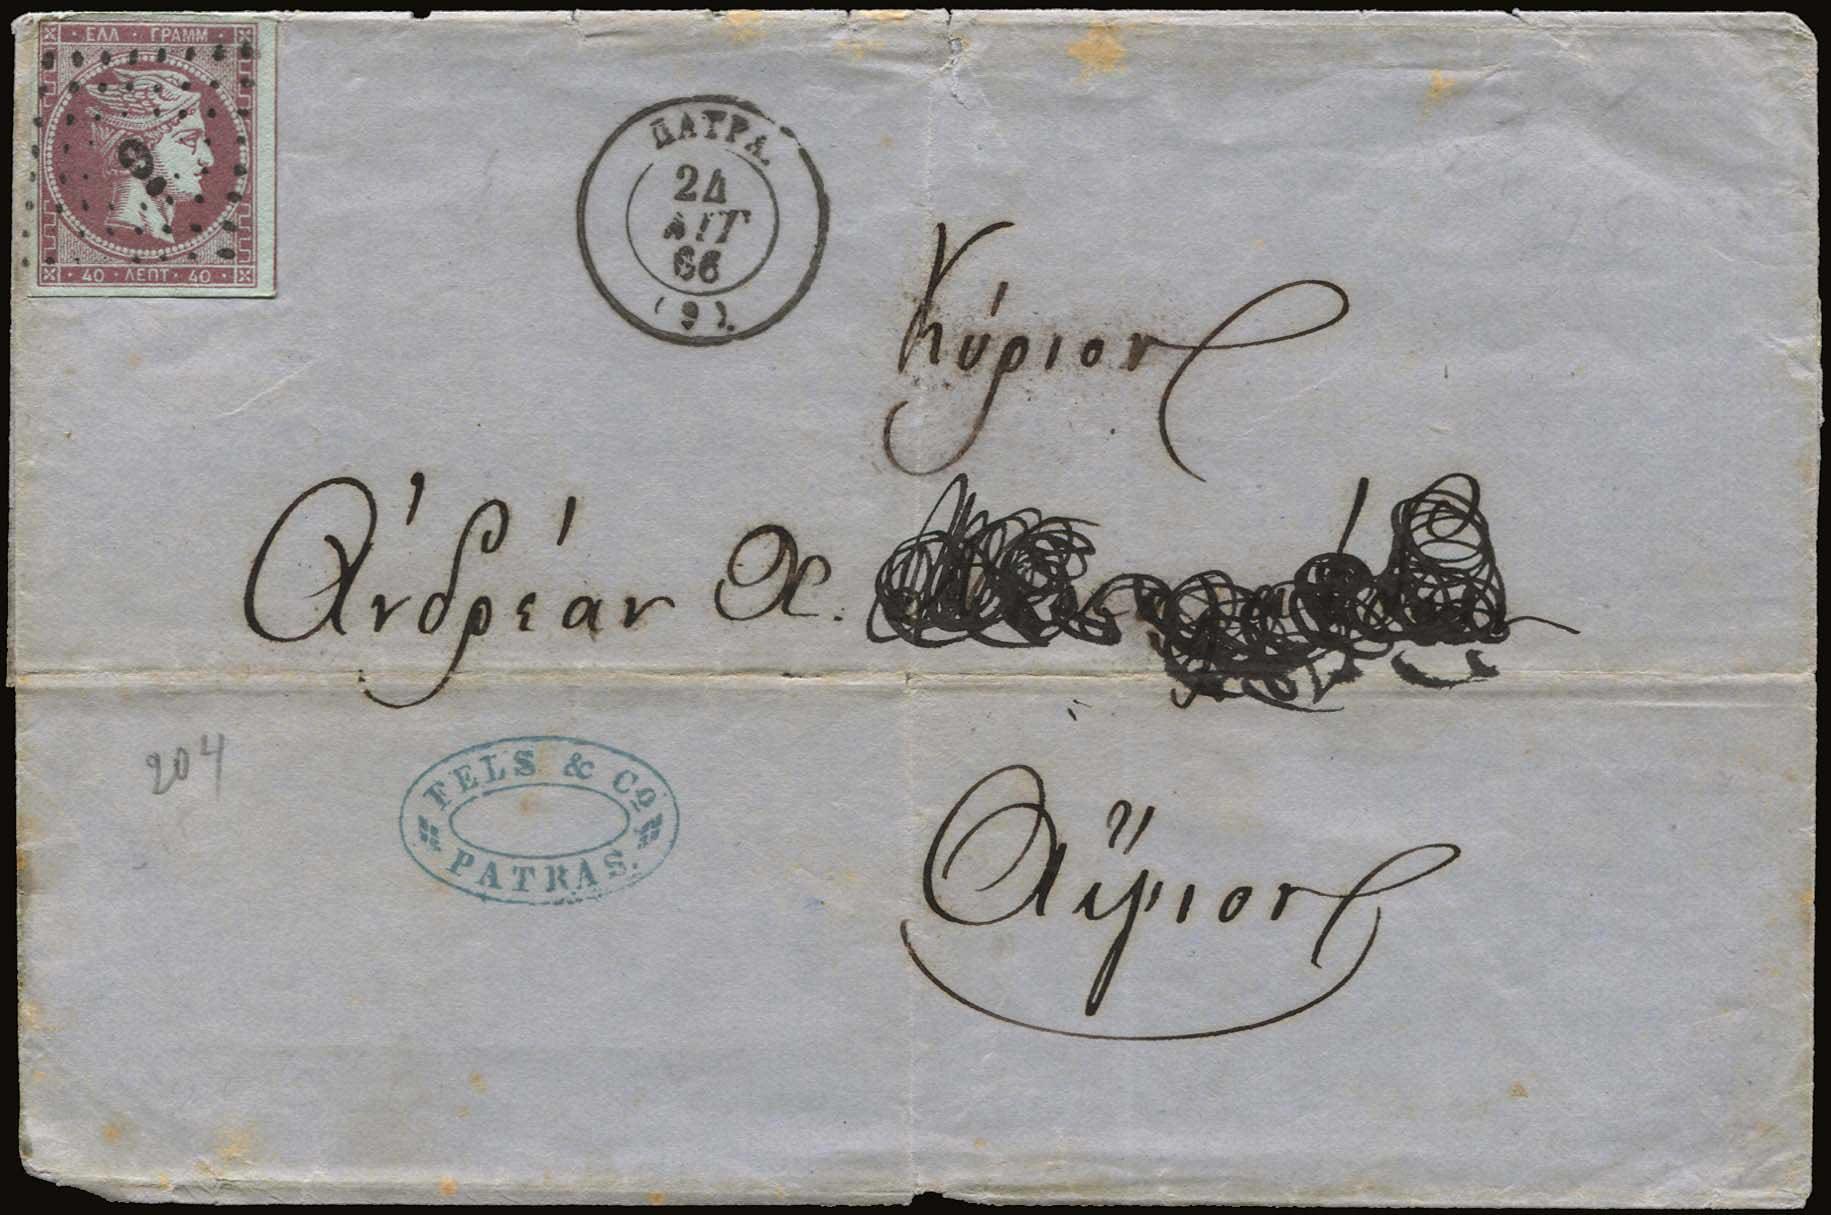 Lot 100 - -  LARGE HERMES HEAD 1862/67 consecutive athens printings -  A. Karamitsos Postal & Live Internet Auction 678 General Philatelic Auction